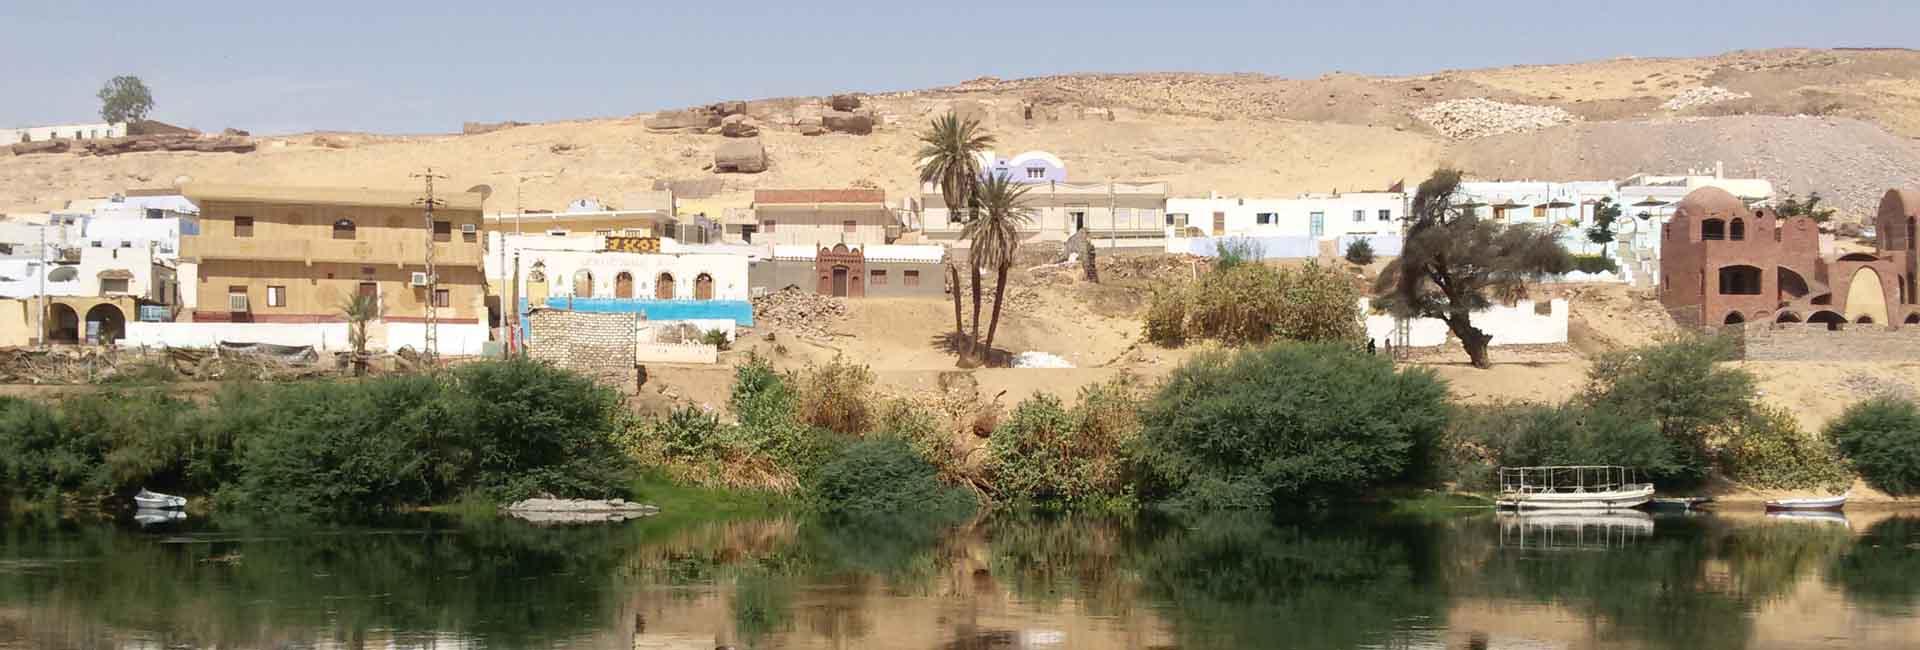 Nubian Village Aswan